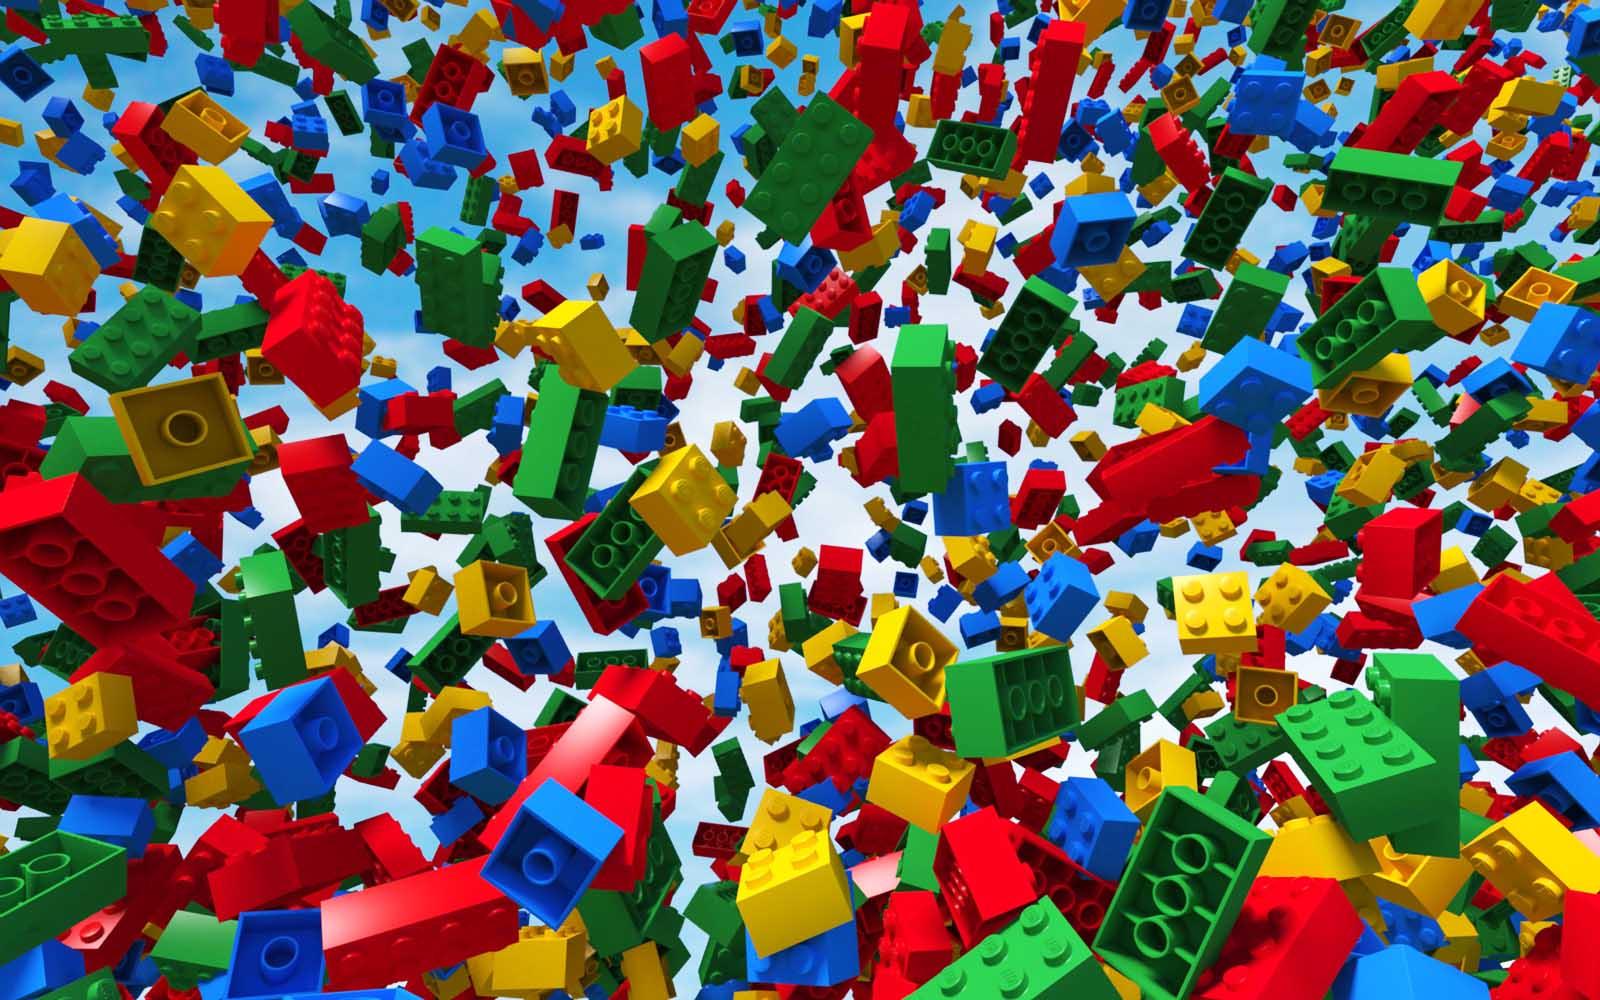 Lego backgrounds - Lego summer wallpaper - Lego Backgrounds .